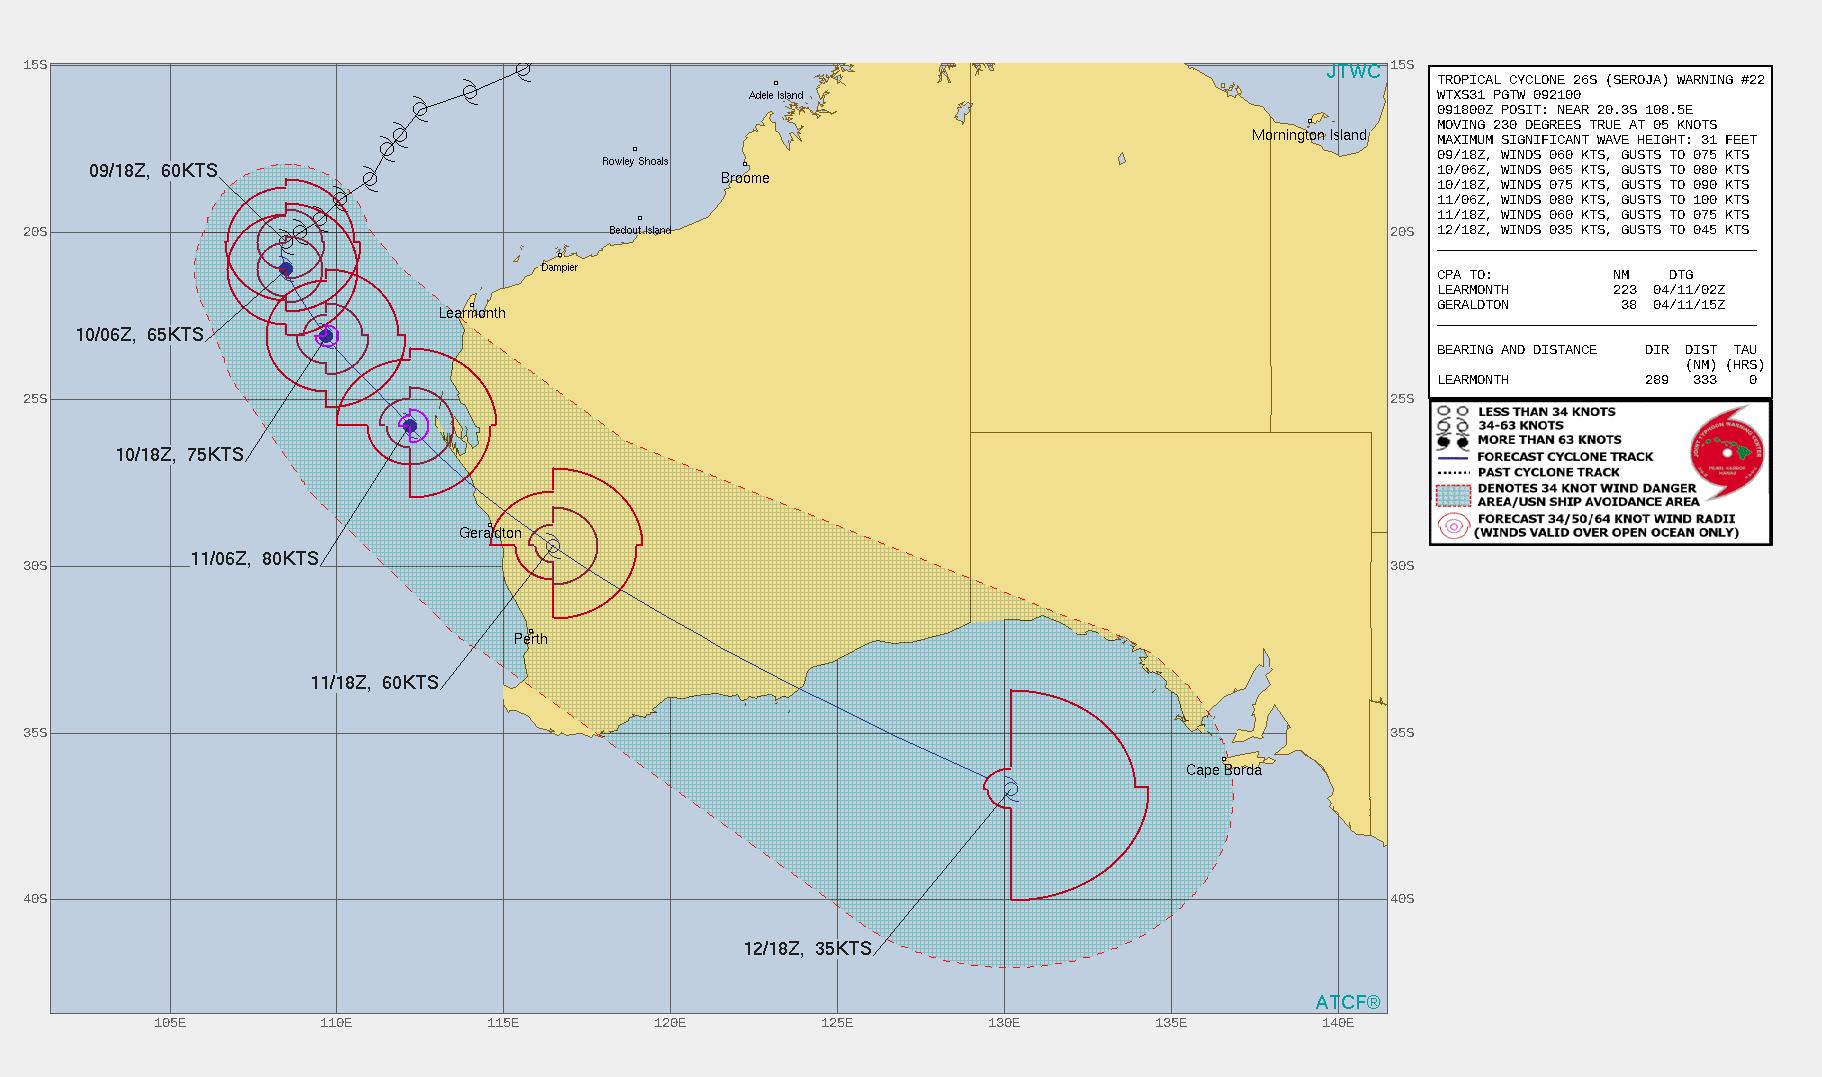 fujiwhara-effect-cyclone-seroja-odette-australia-landfall-track